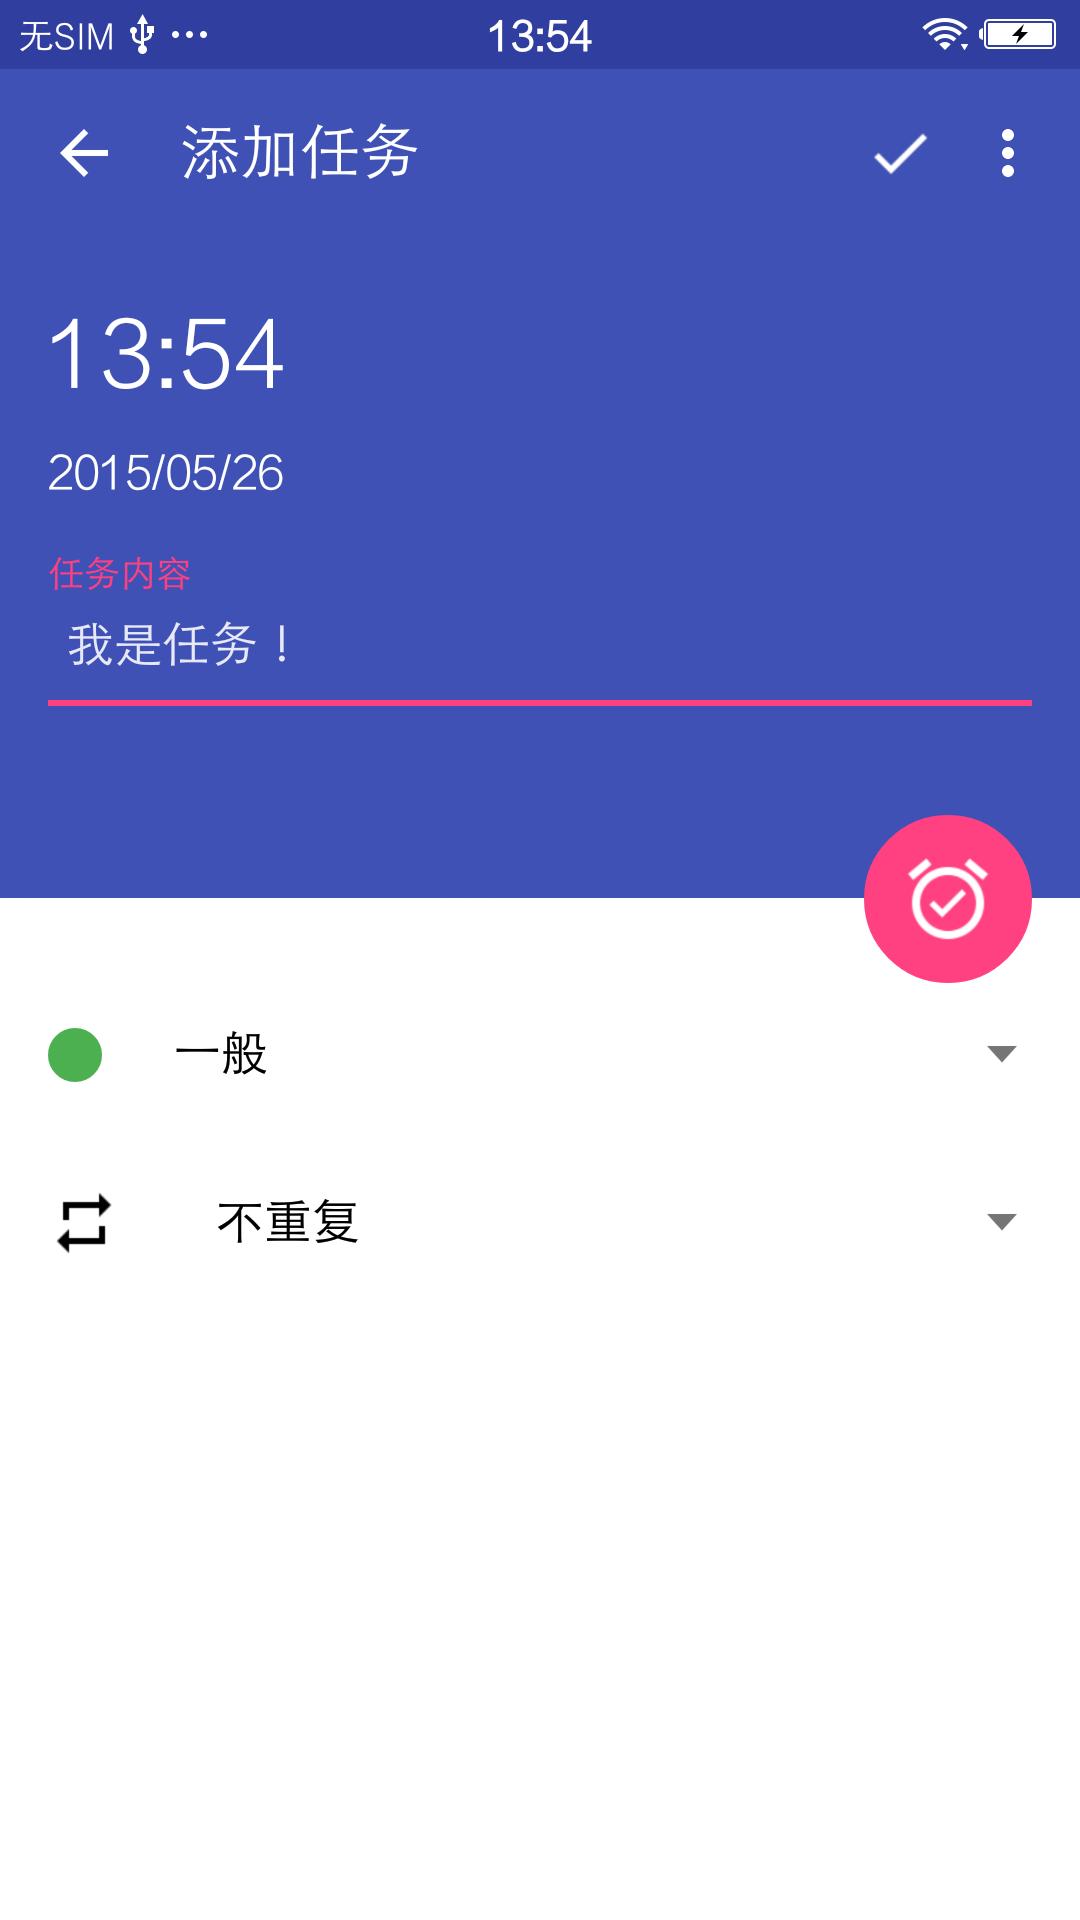 TT日程管理 V3.0.2 安卓版截图6